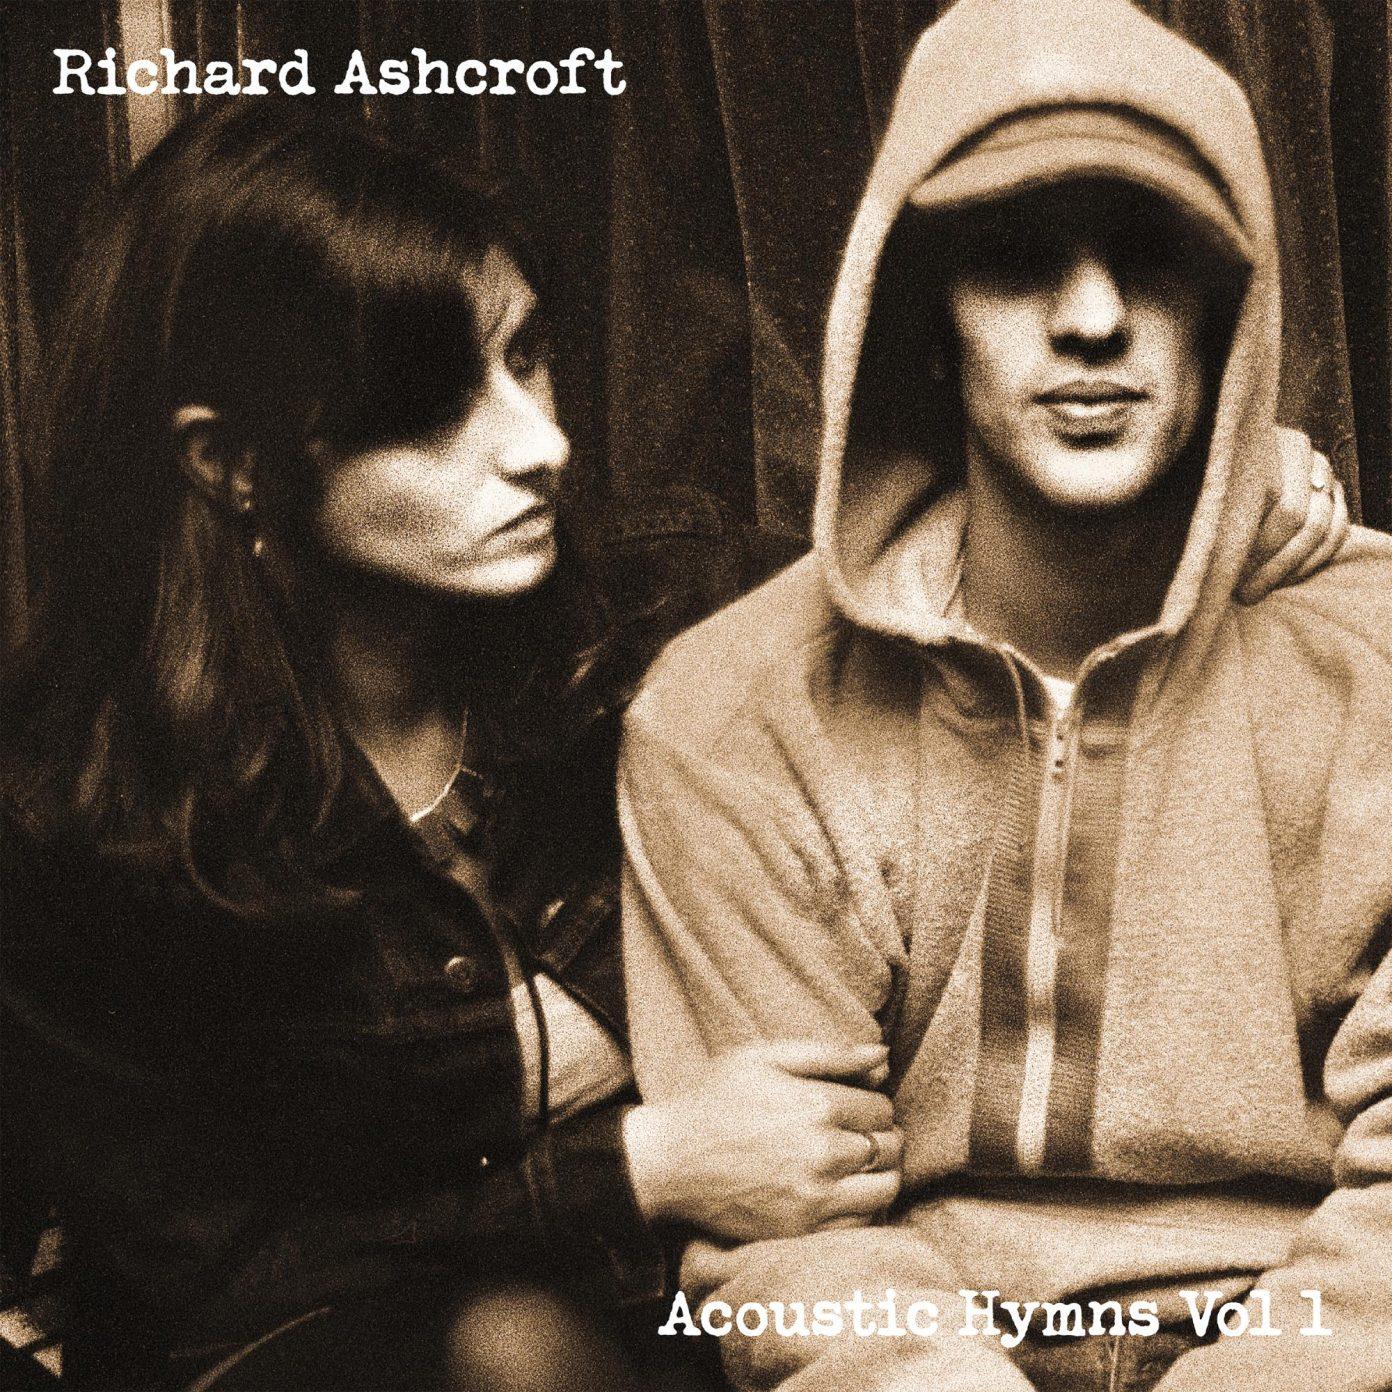 News – Richard Ashcroft – Acoustic Hymns Vol. 1